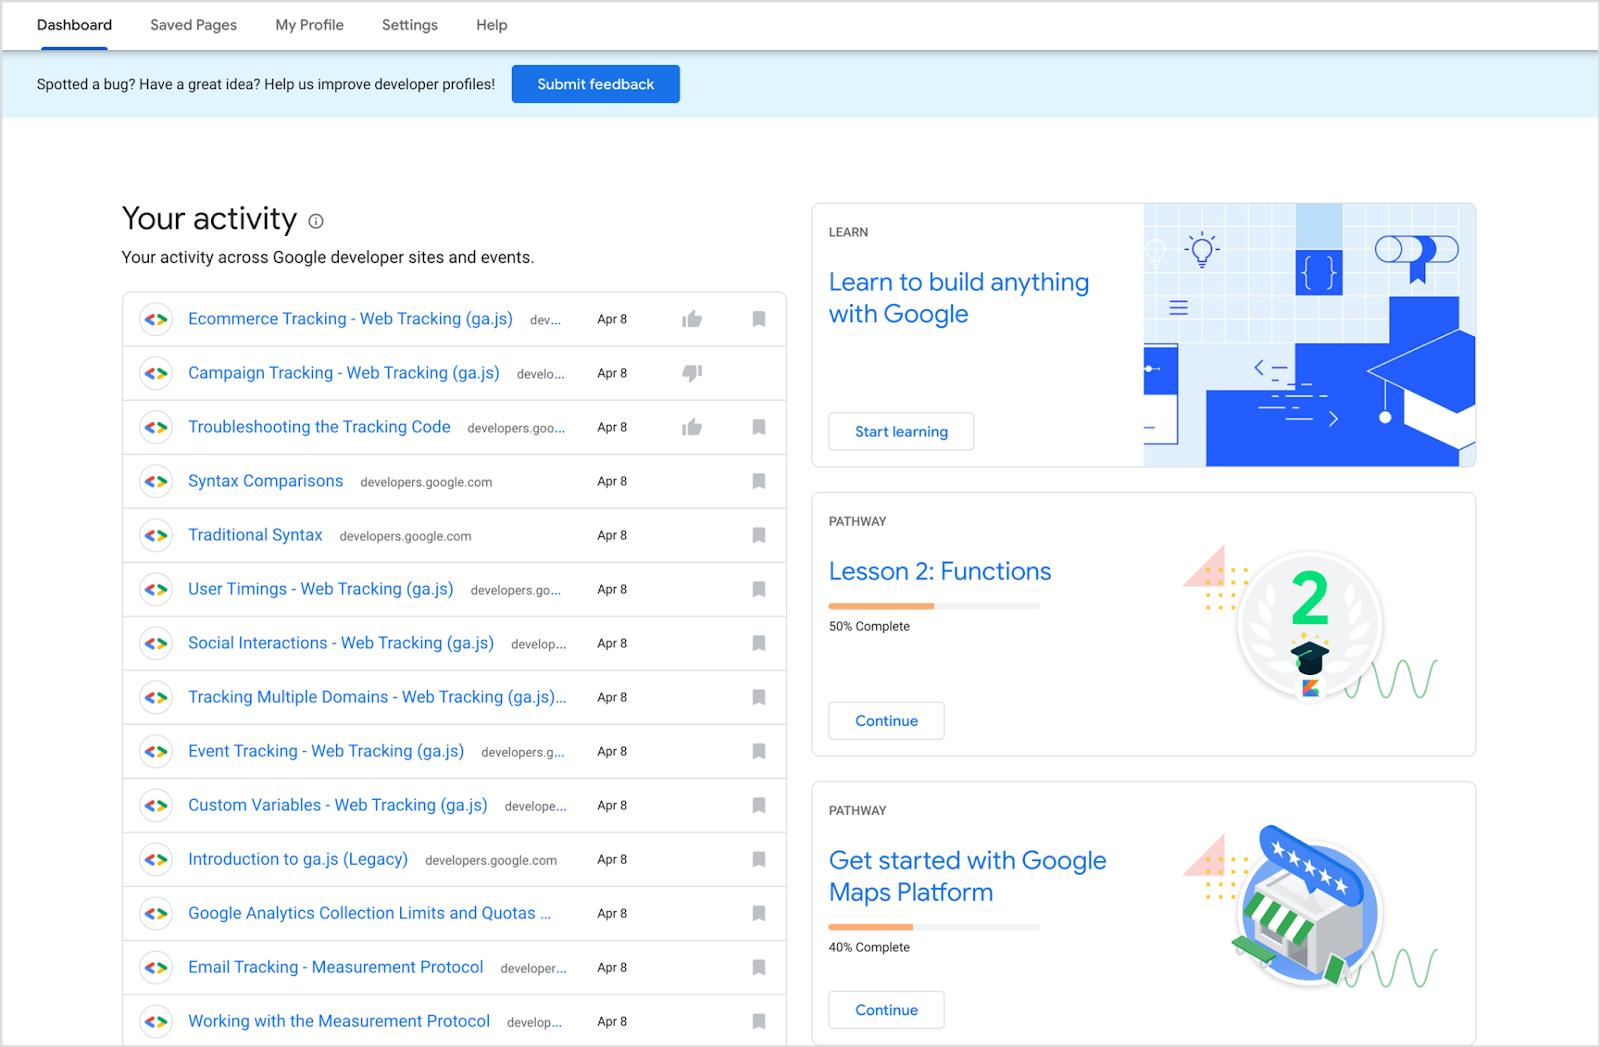 Google Geliştirici Profili kontrol paneli